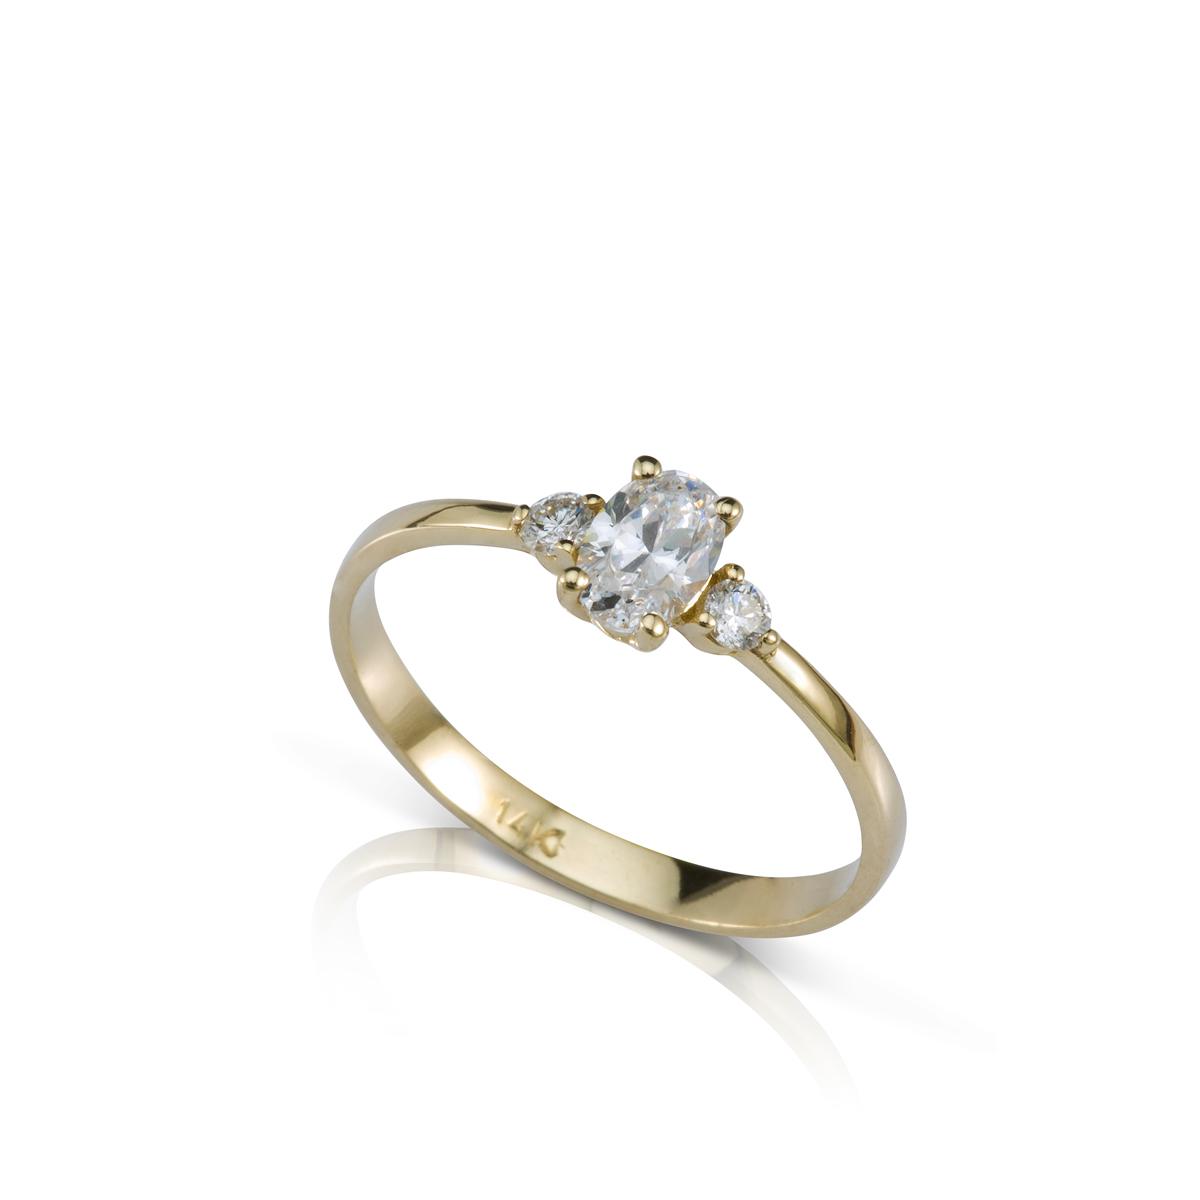 Oval shaped diamond engagment ring